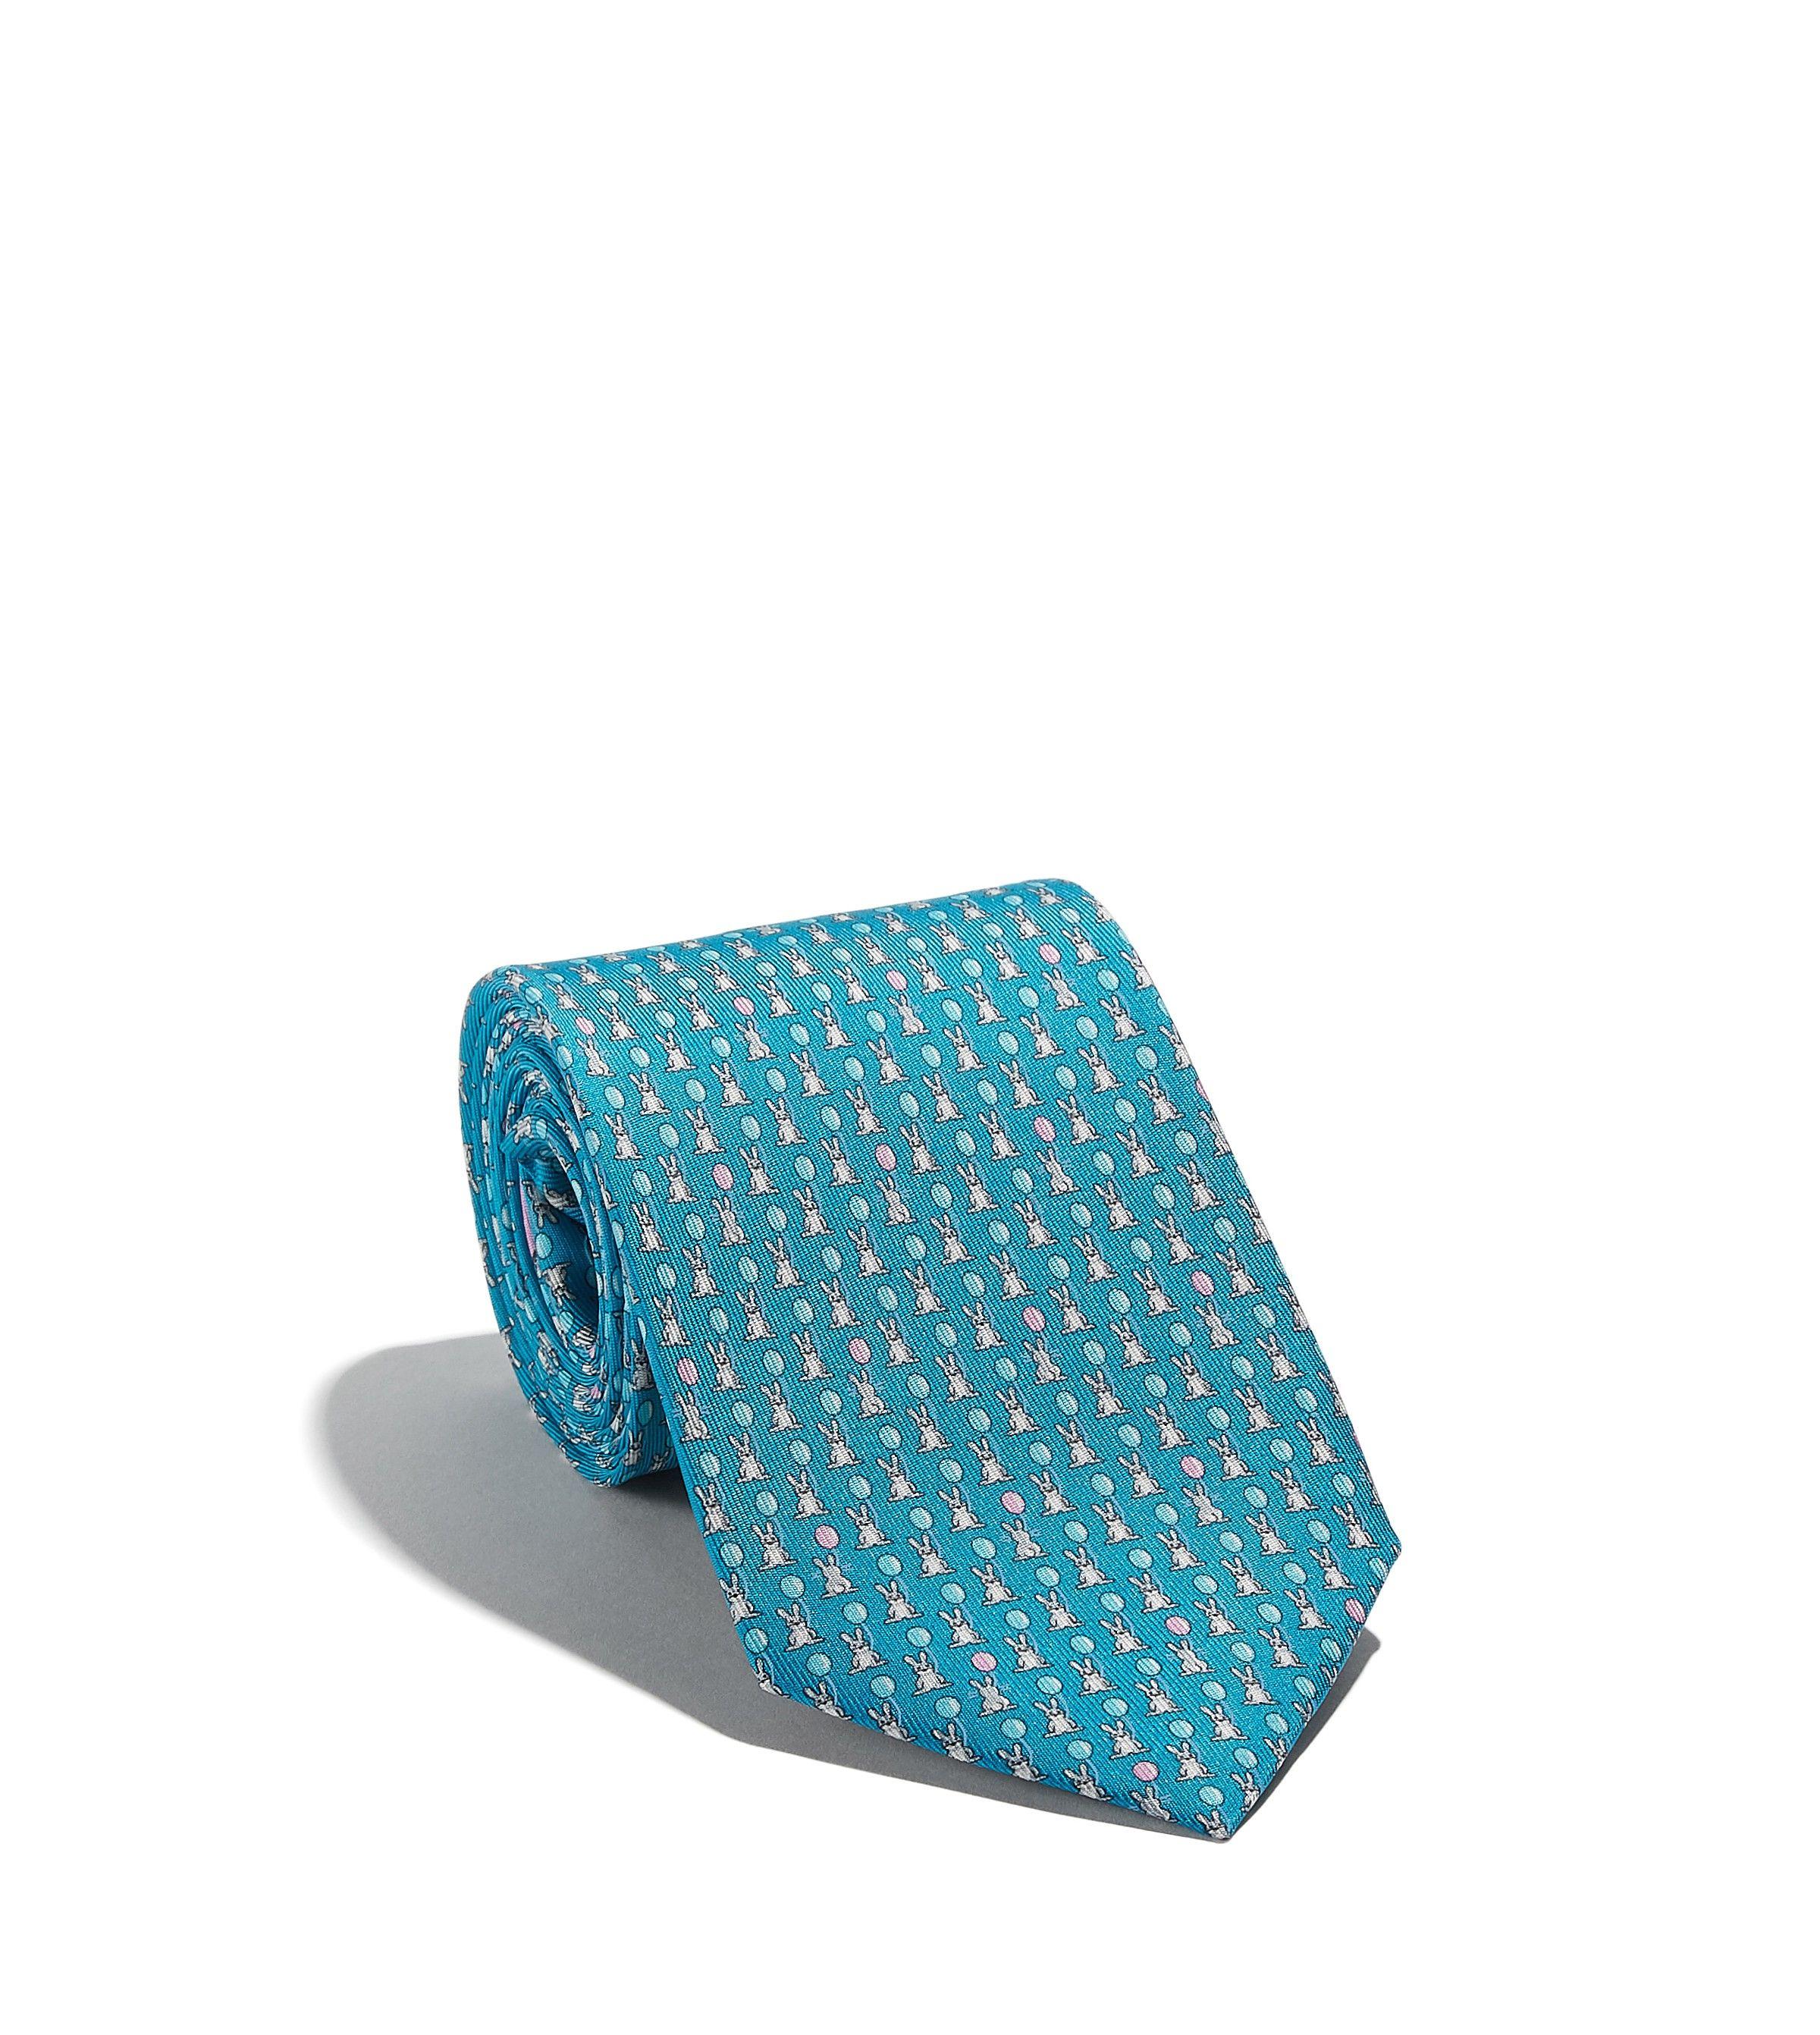 37a32f150c68 SALVATORE FERRAGAMO Bunny With Balloon Printed Tie. #salvatoreferragamo #